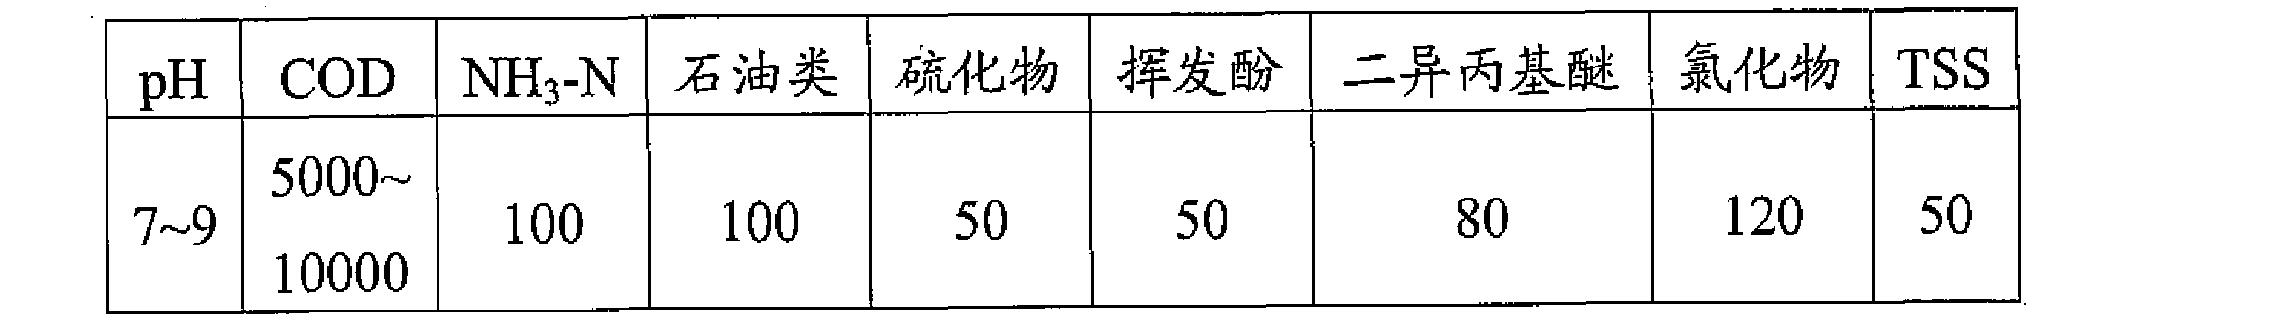 Figure CN202430088UD00092